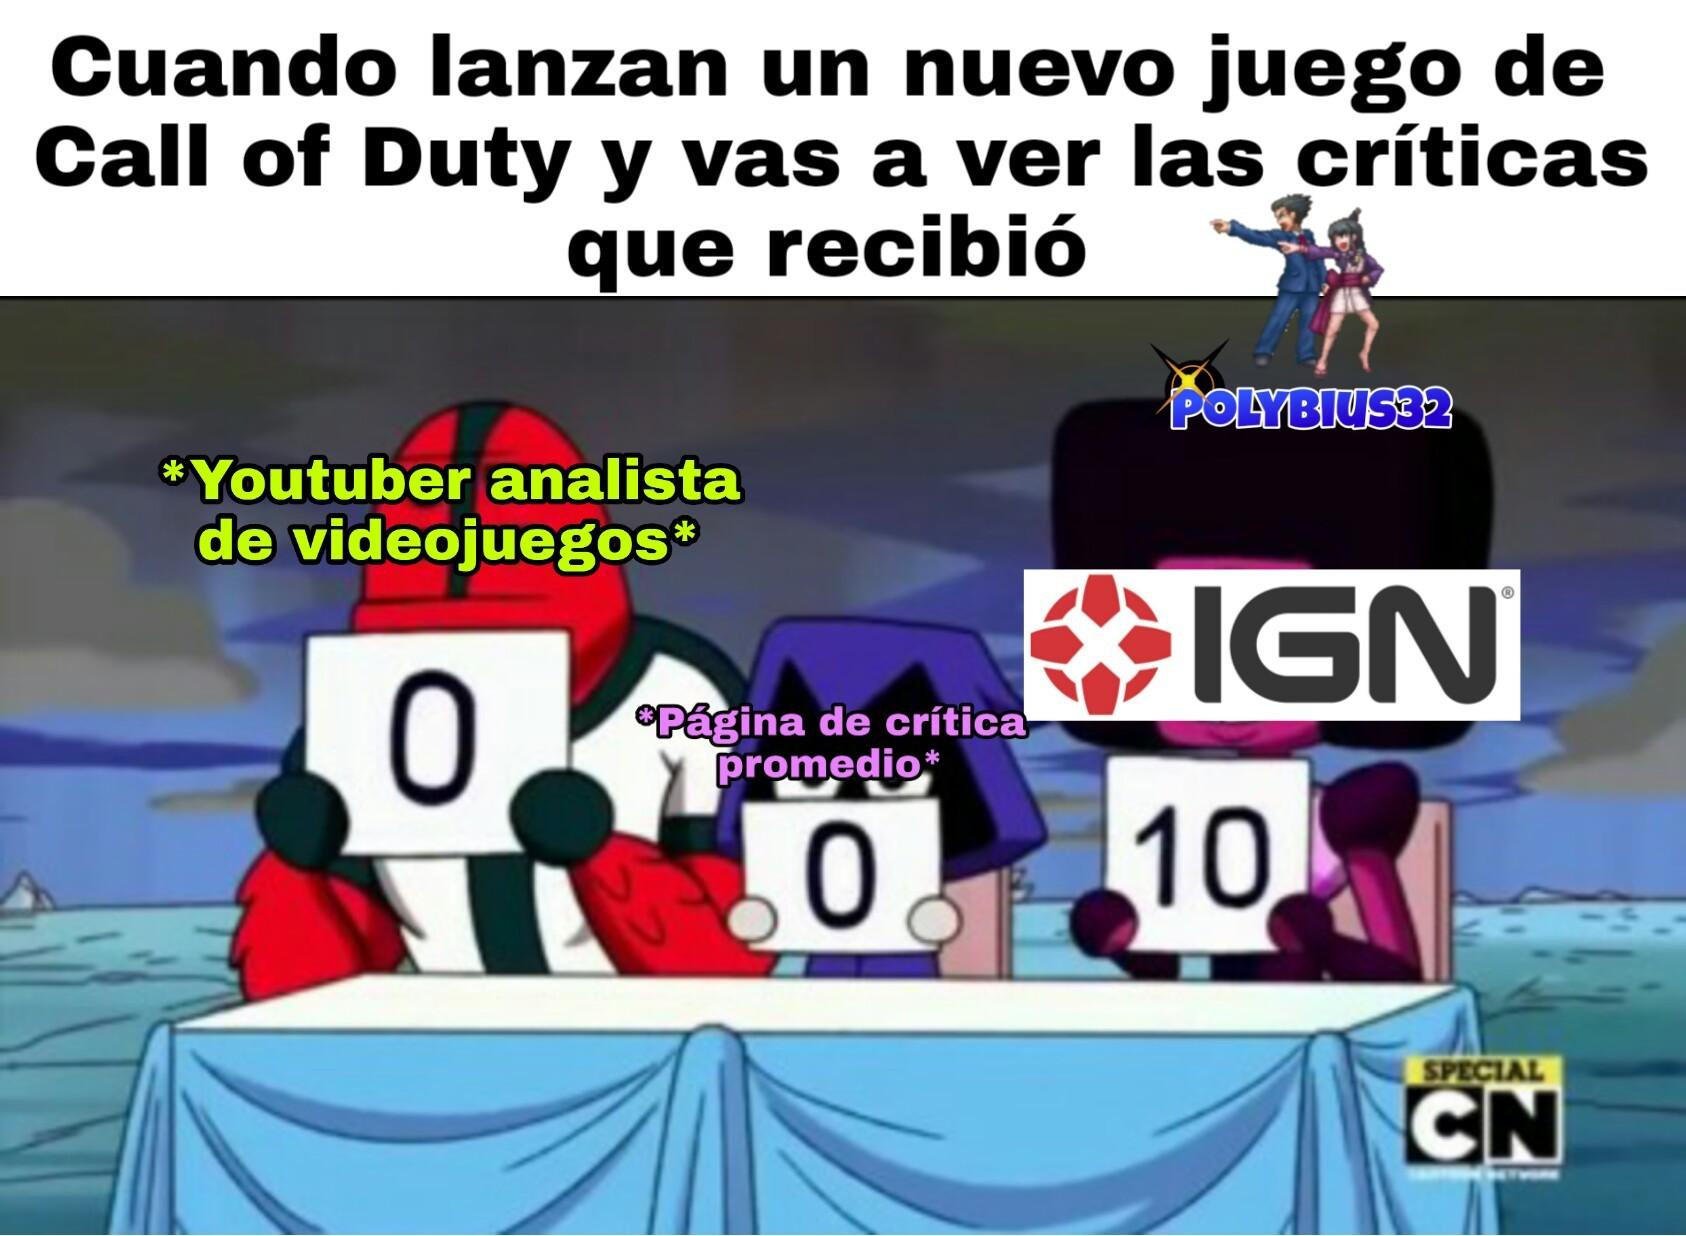 Y luego se quejan de Gamergate - meme